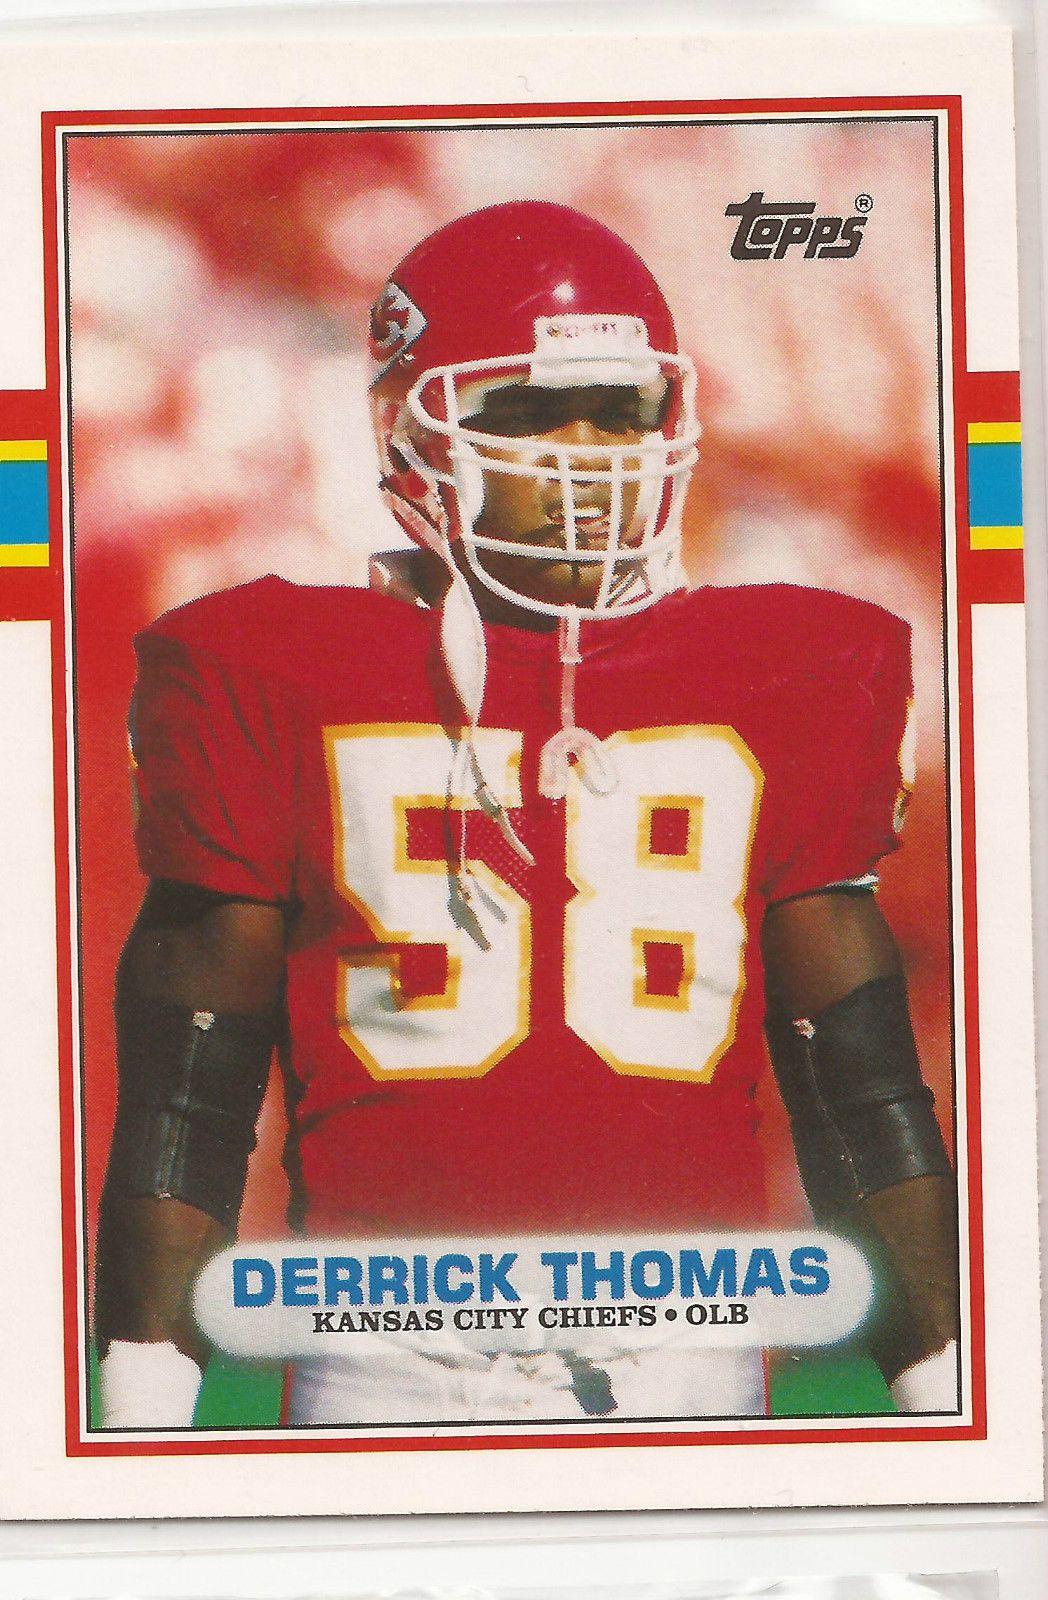 Derrick Thomas With Images Derrick Thomas Kansas City Chiefs Football Cards